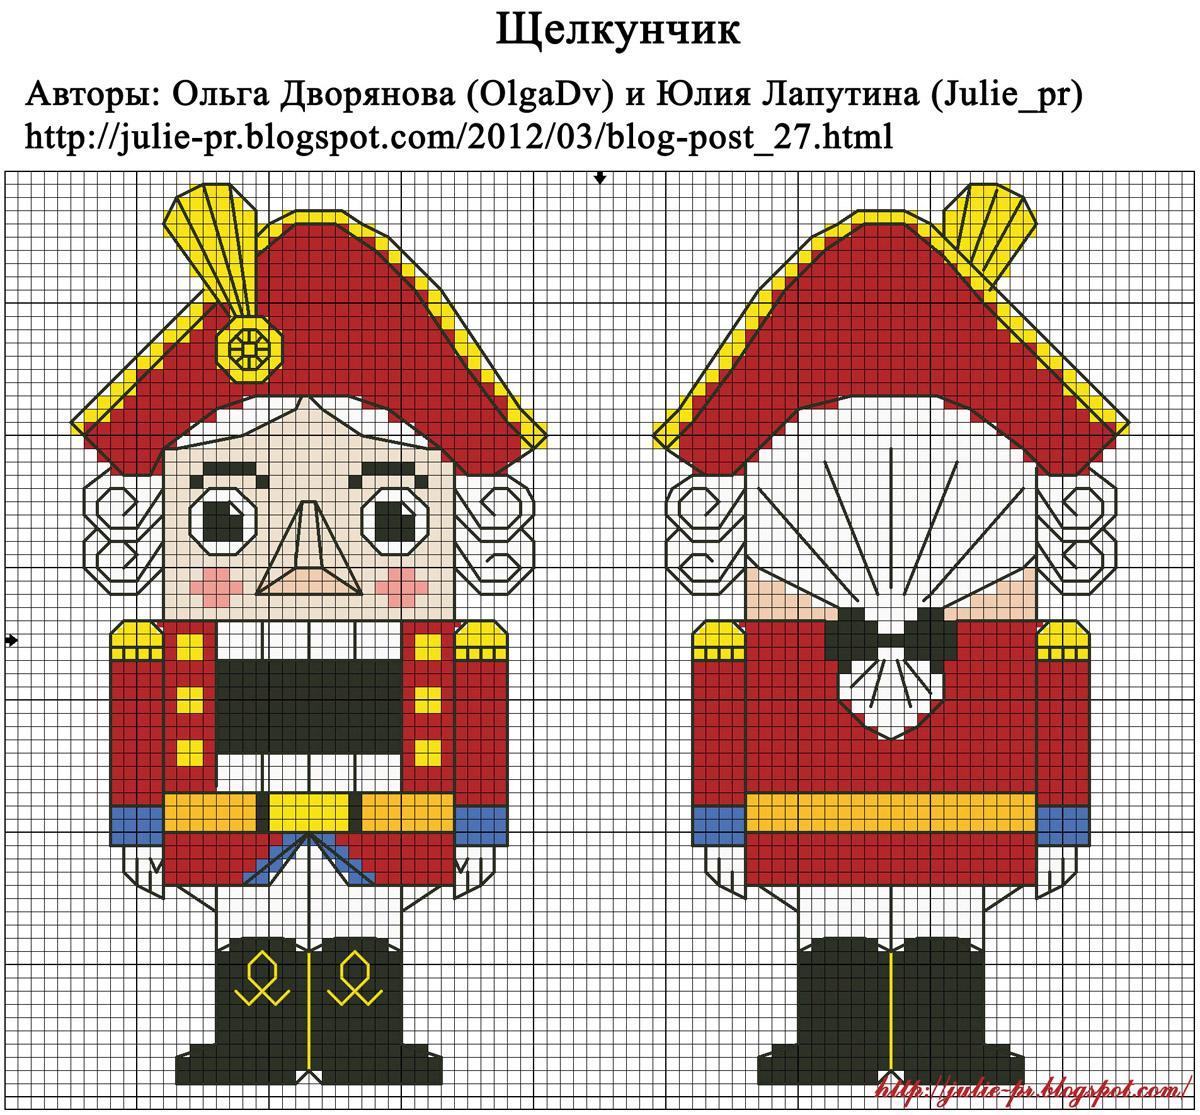 Щелкунчик Nutcracker вышивка cross stitch елочная игрушка Юлия Лапутина схема